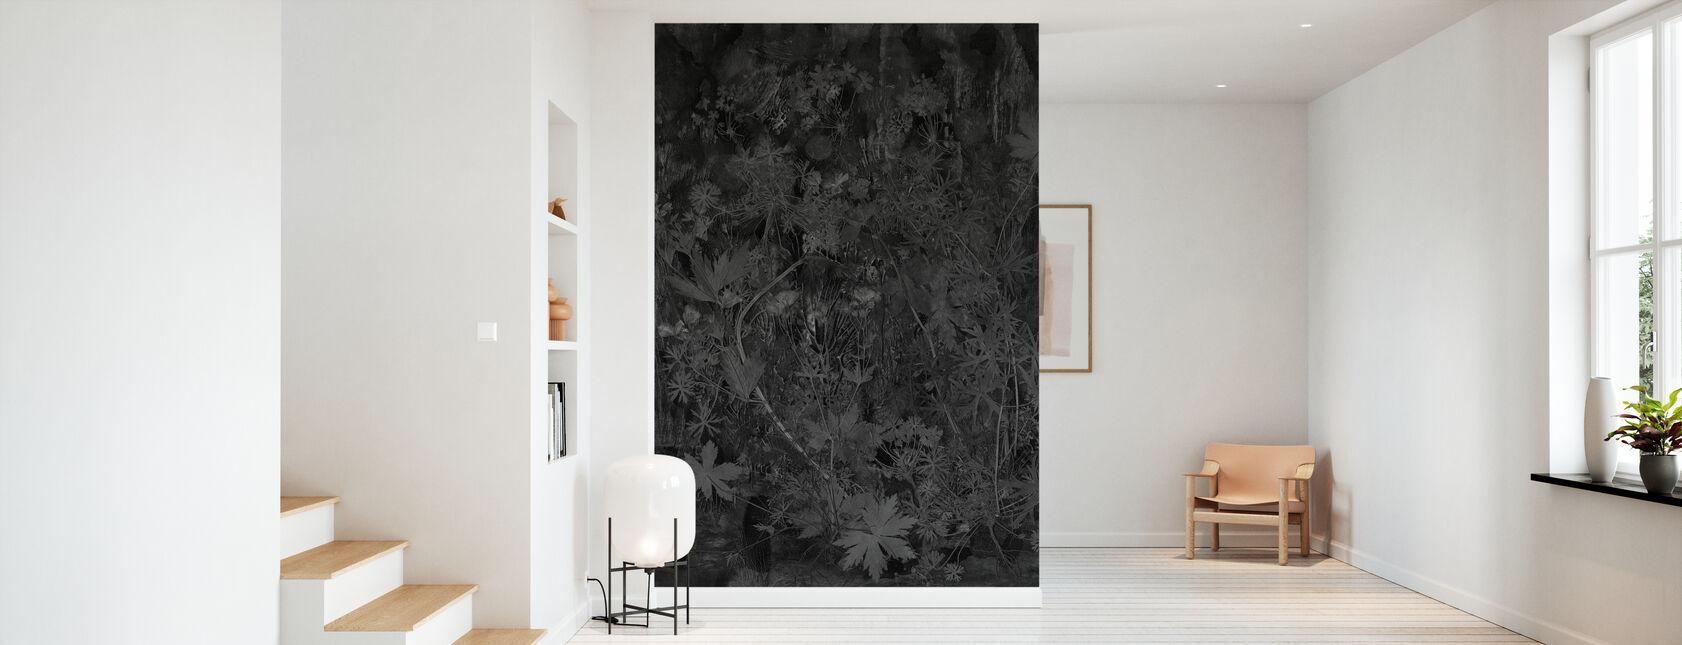 Flora Hysterica 3 - Wallpaper - Hallway